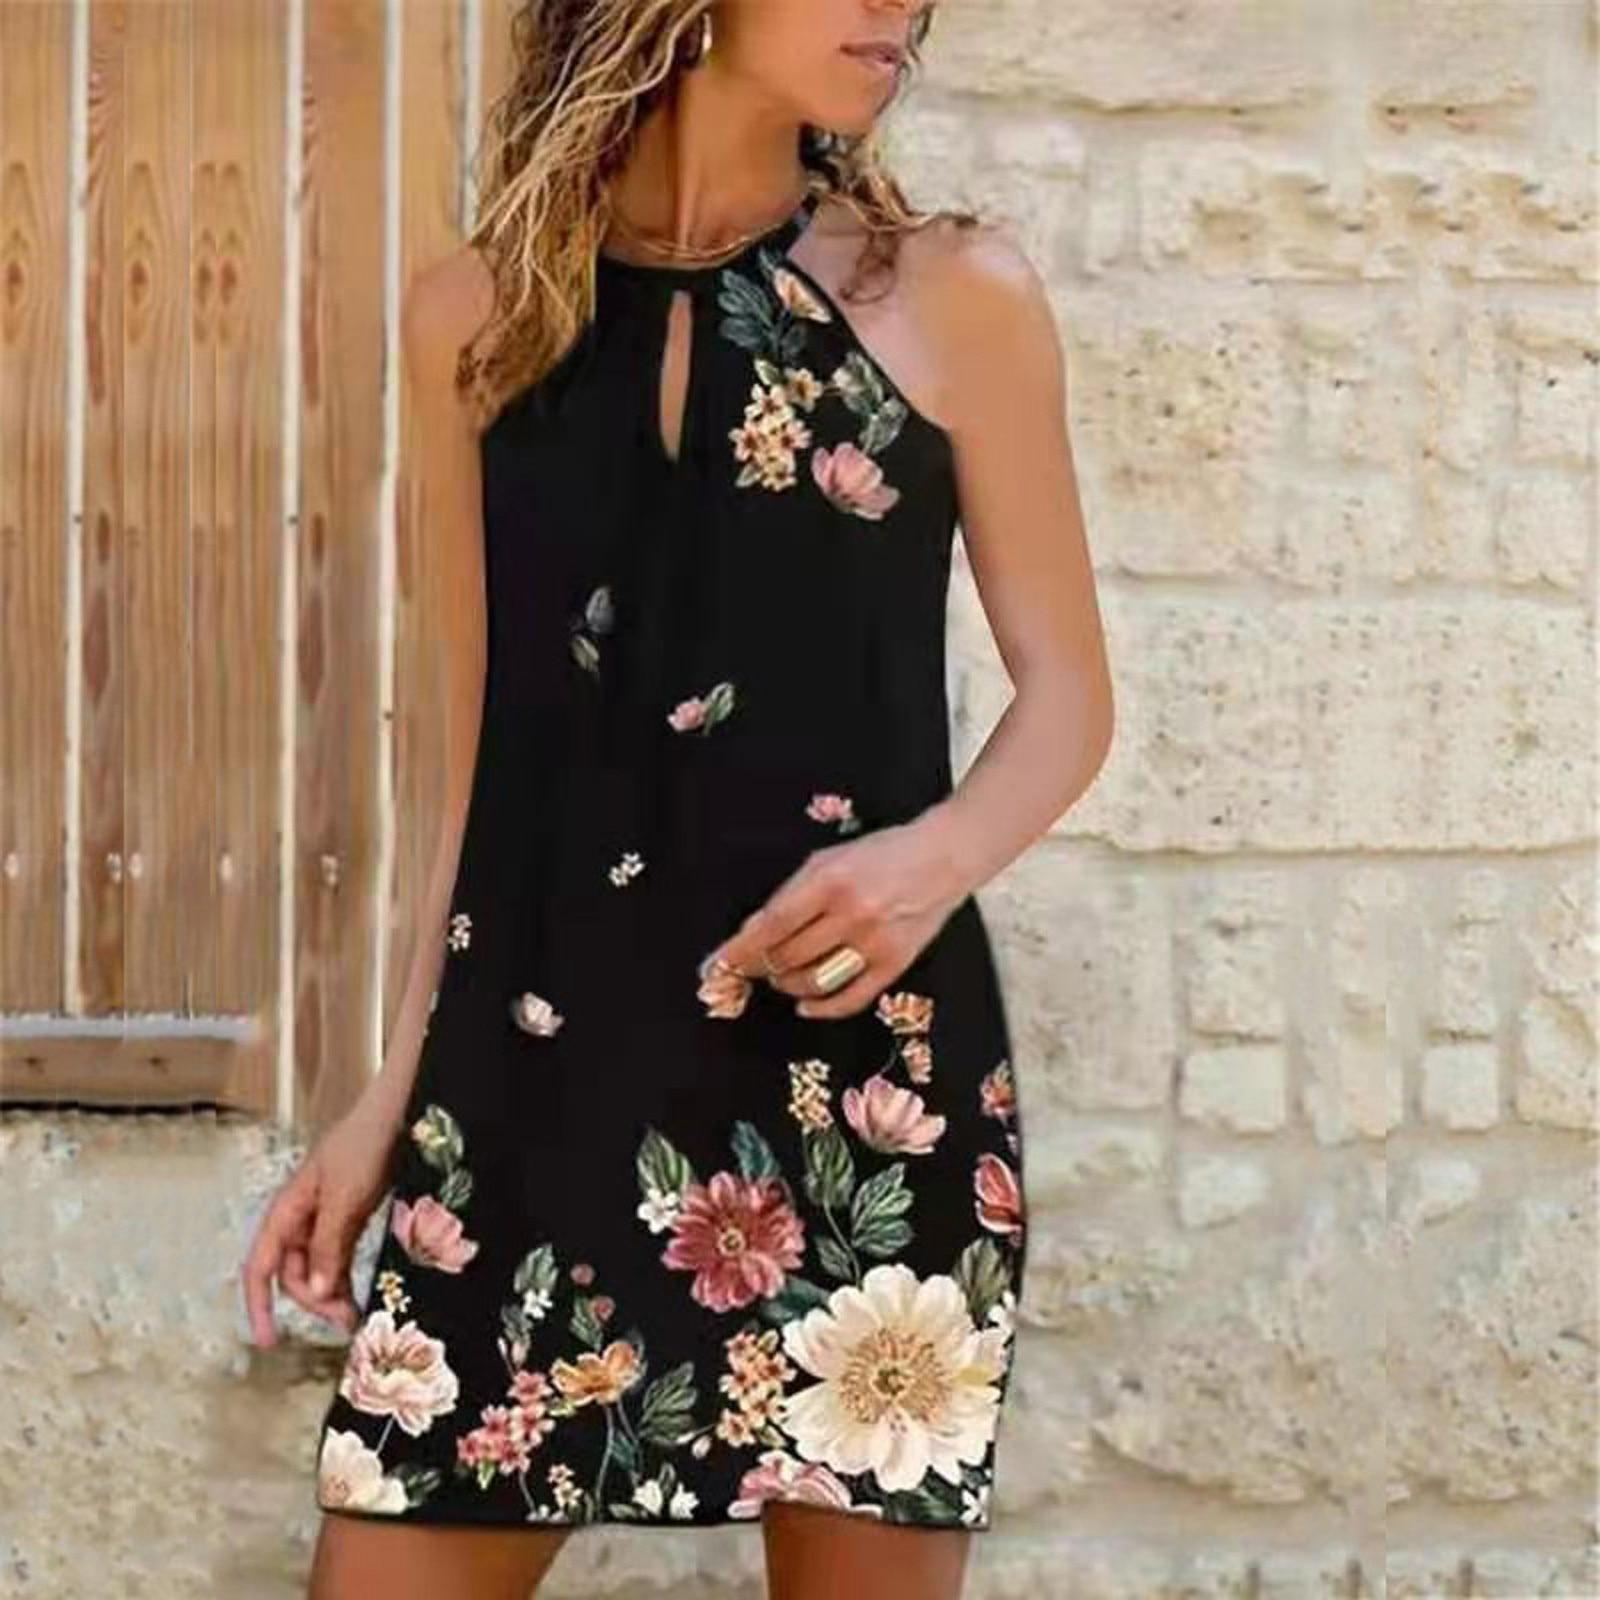 Halter Summer Beach Dress Women Vintage Floral Print Party Dress Elegant Office Lady Mini Casual Dress Vestido Plus Size